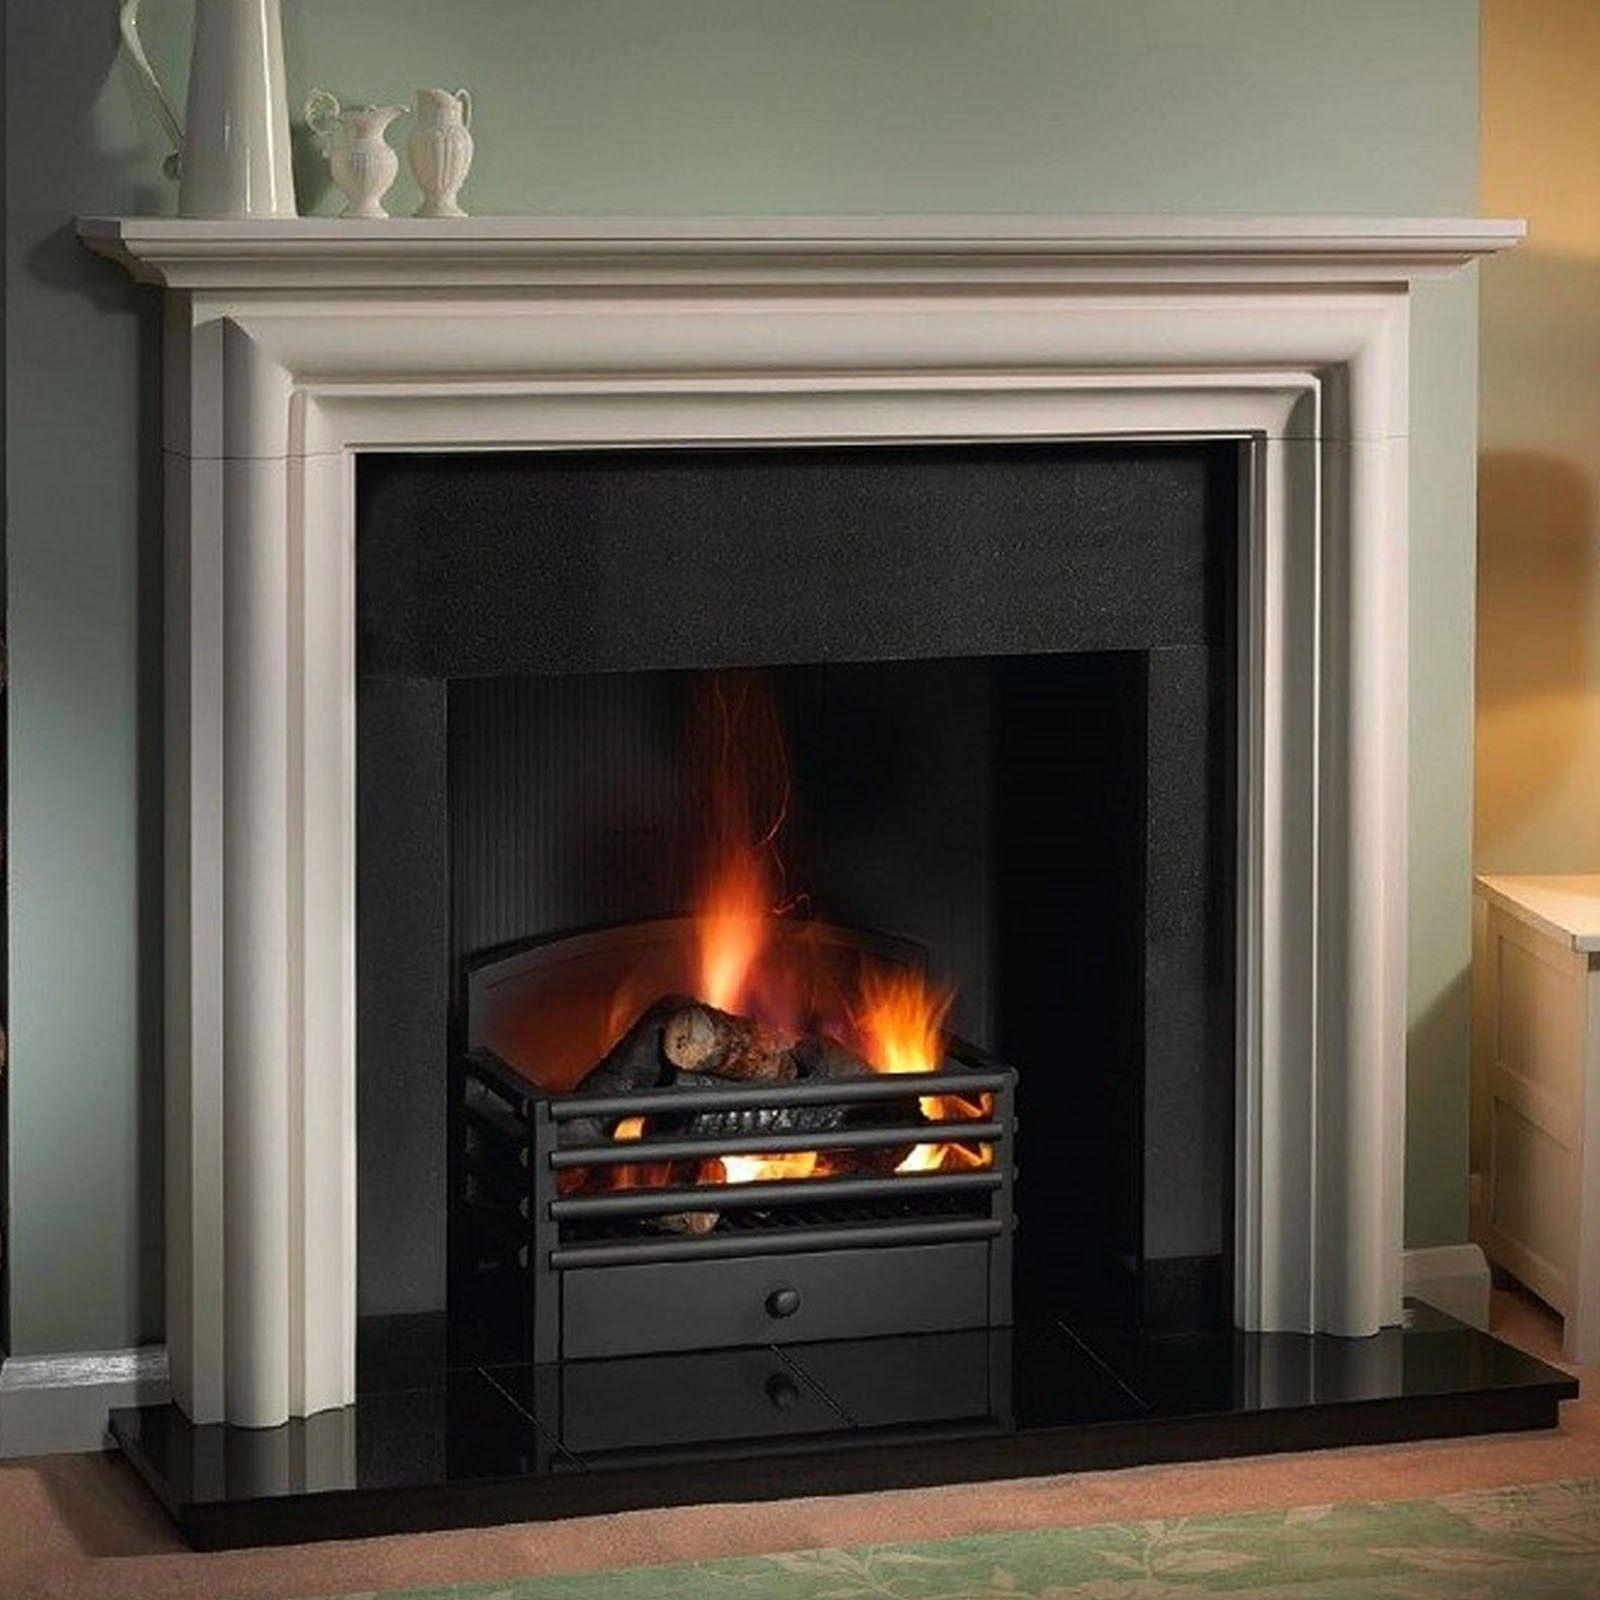 Living room modena limestone fireplace suite mantel and shelf